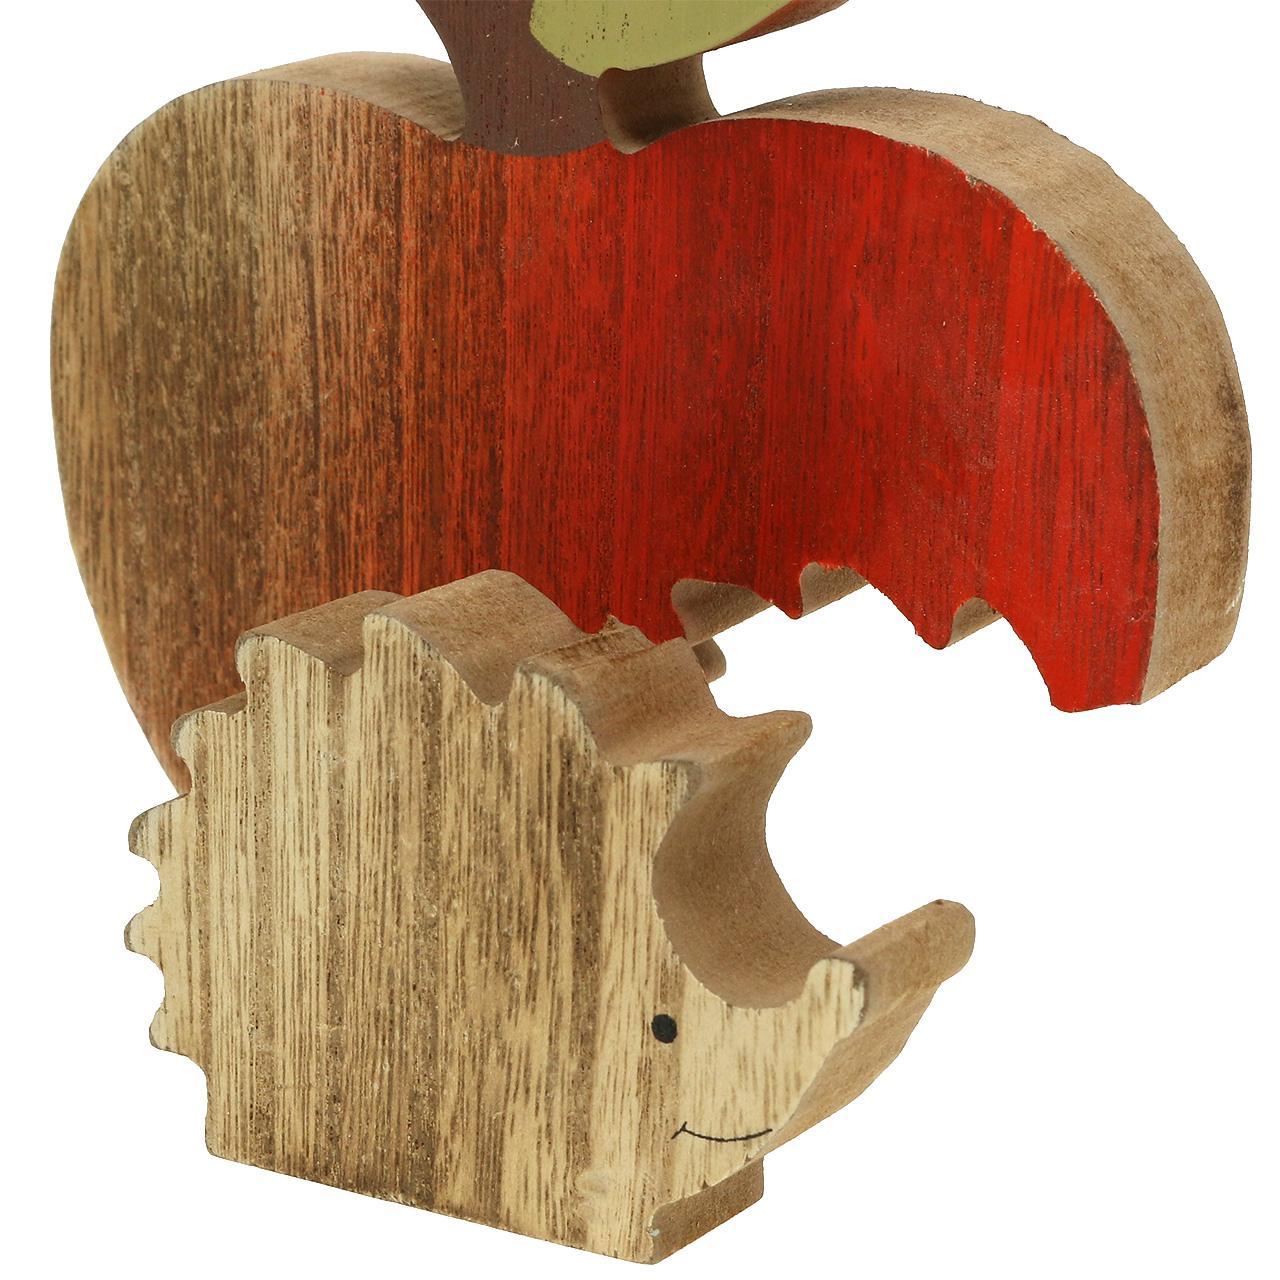 dekofigur apfel mit igel rot natur 13cm 3st großhandel